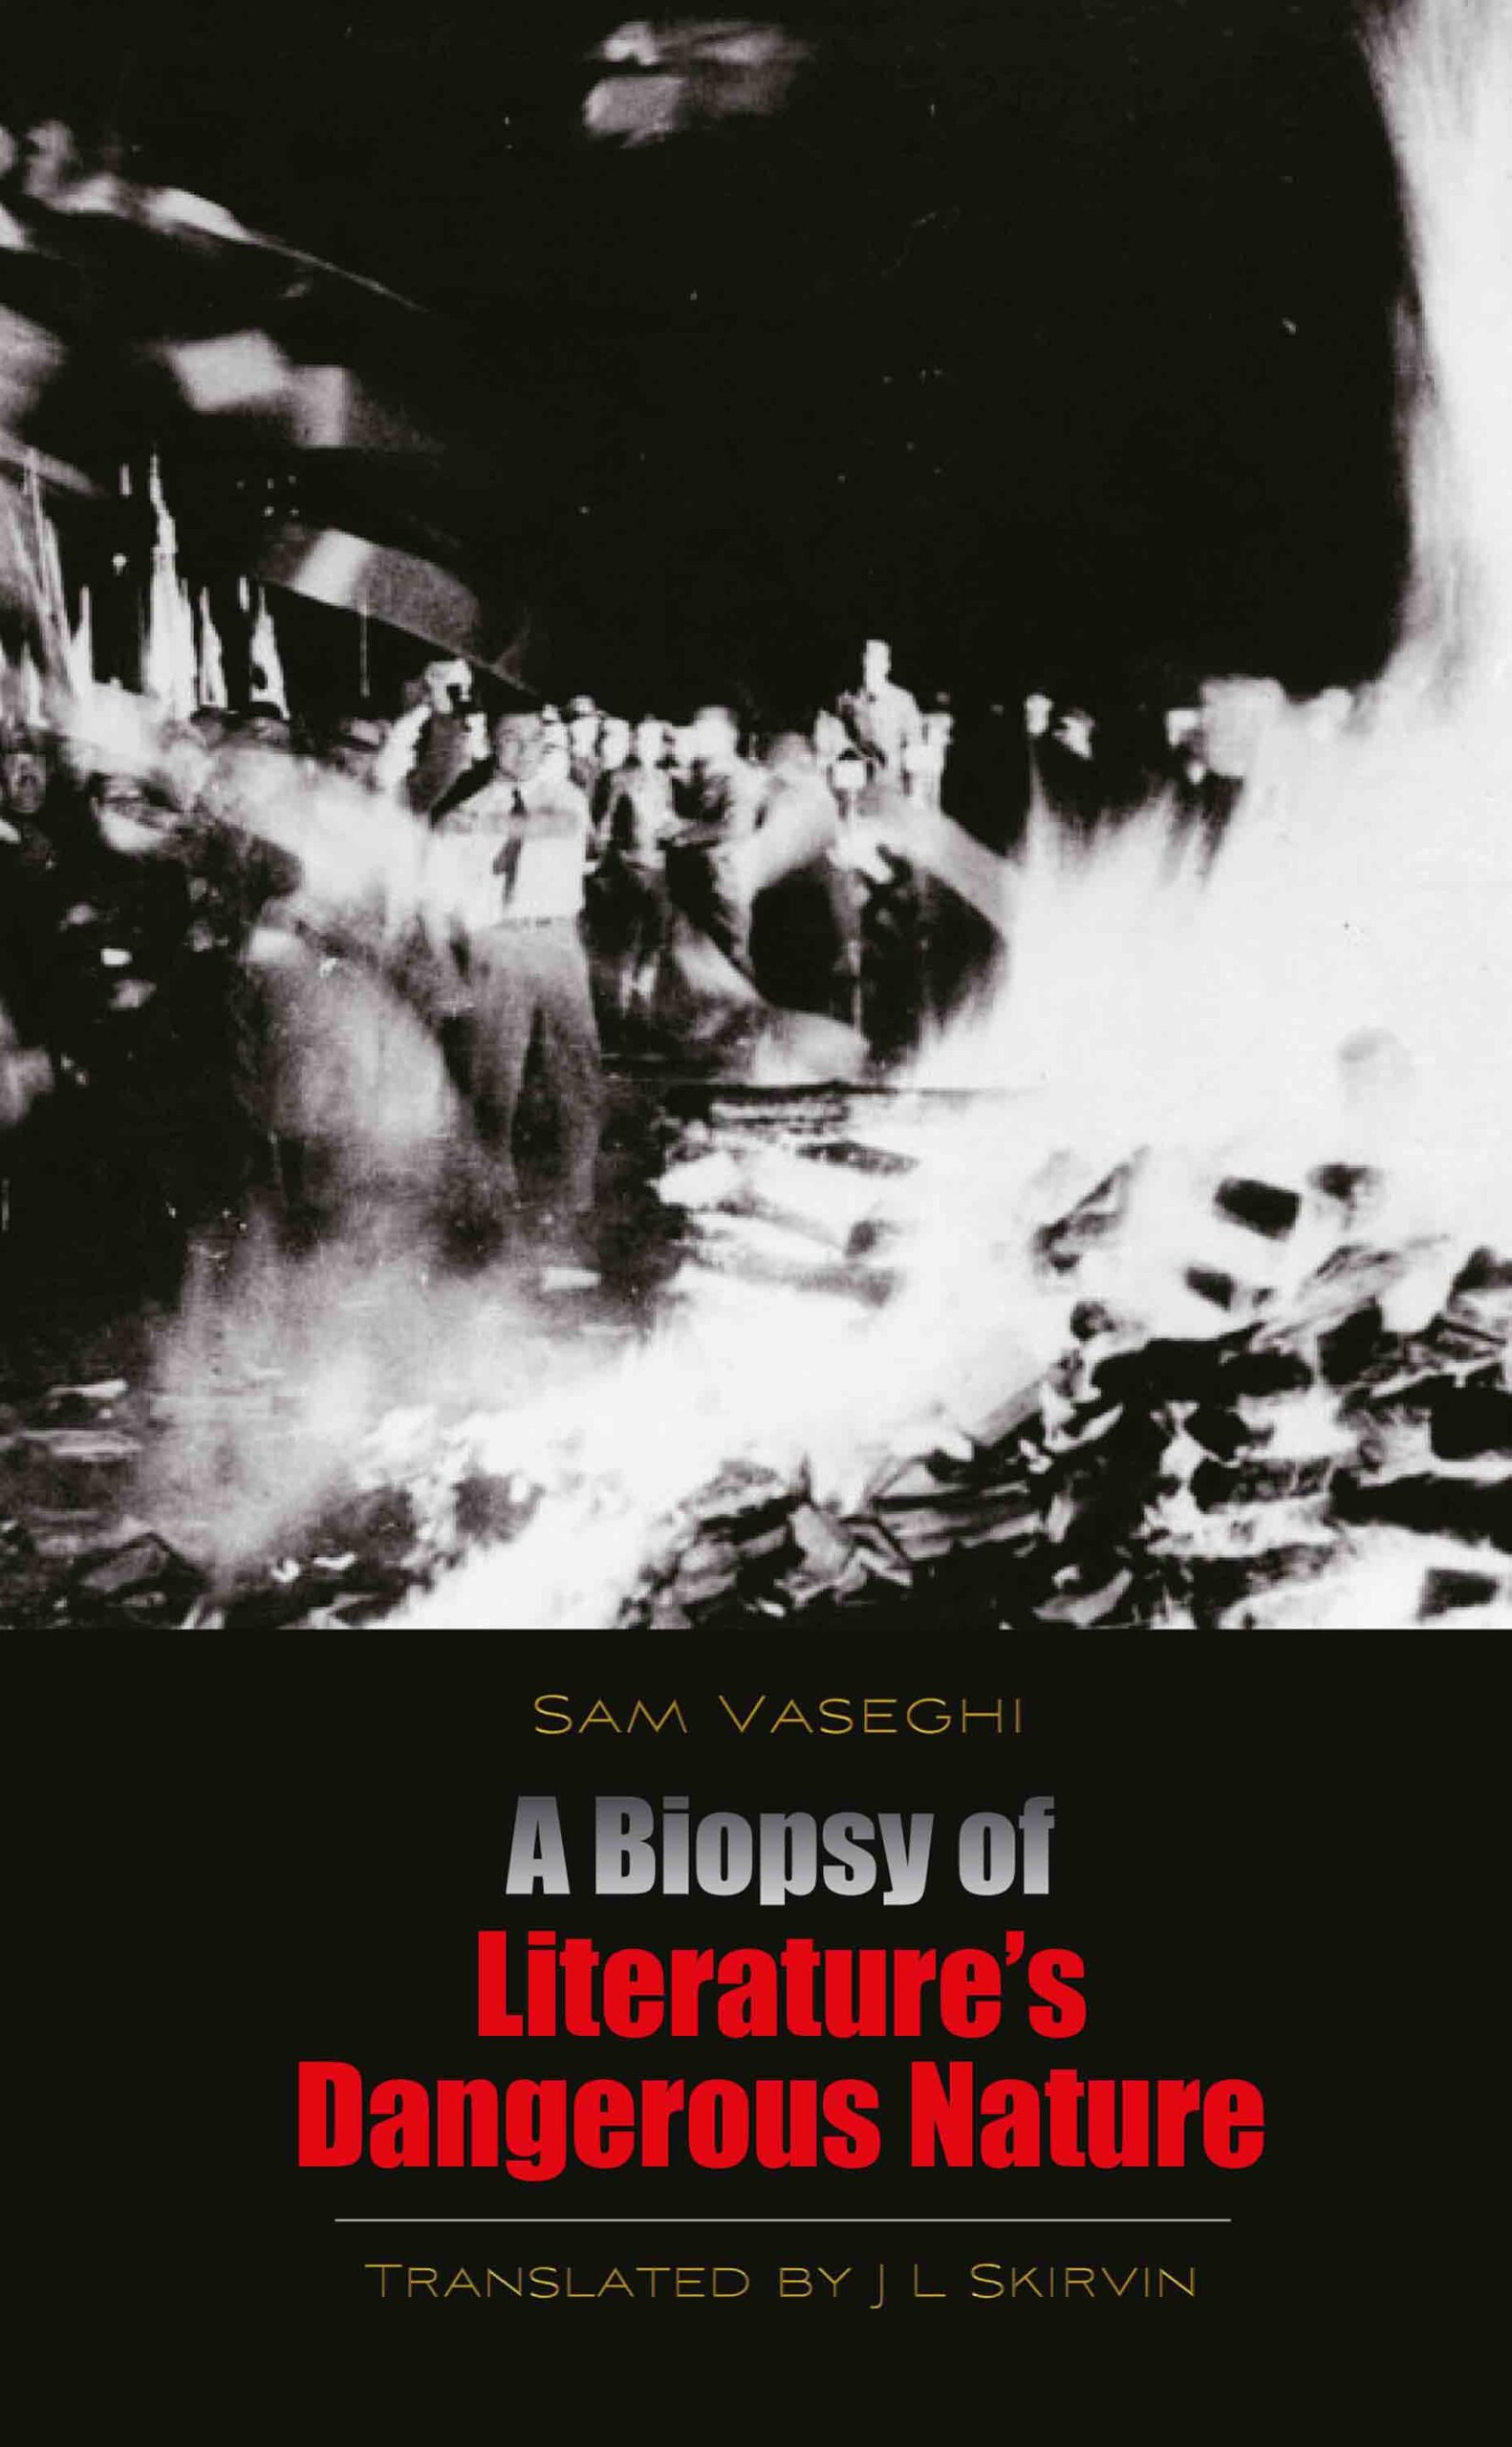 A Biopsy of Literature's Dangerous Nature